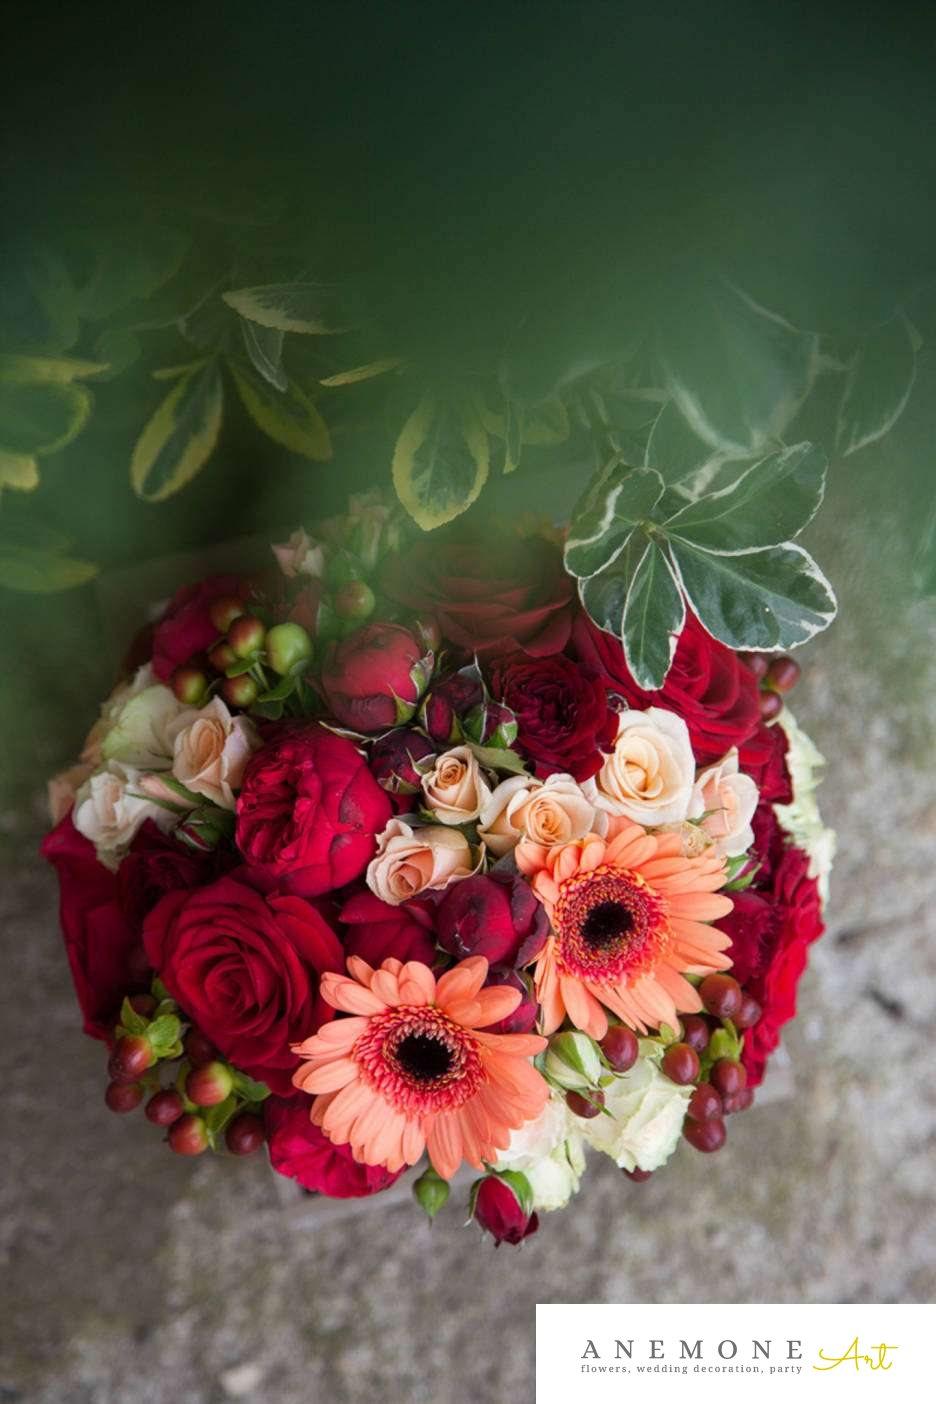 Poza, foto cu Flori de nunta alb, buchet mireasa, gerbera, mini-rosa, piersica, rosu, rotund, trandafiri, visiniu in Arad, Timisoara, Oradea (wedding flowers, bouquets) nunta Arad, Timisoara, Oradea